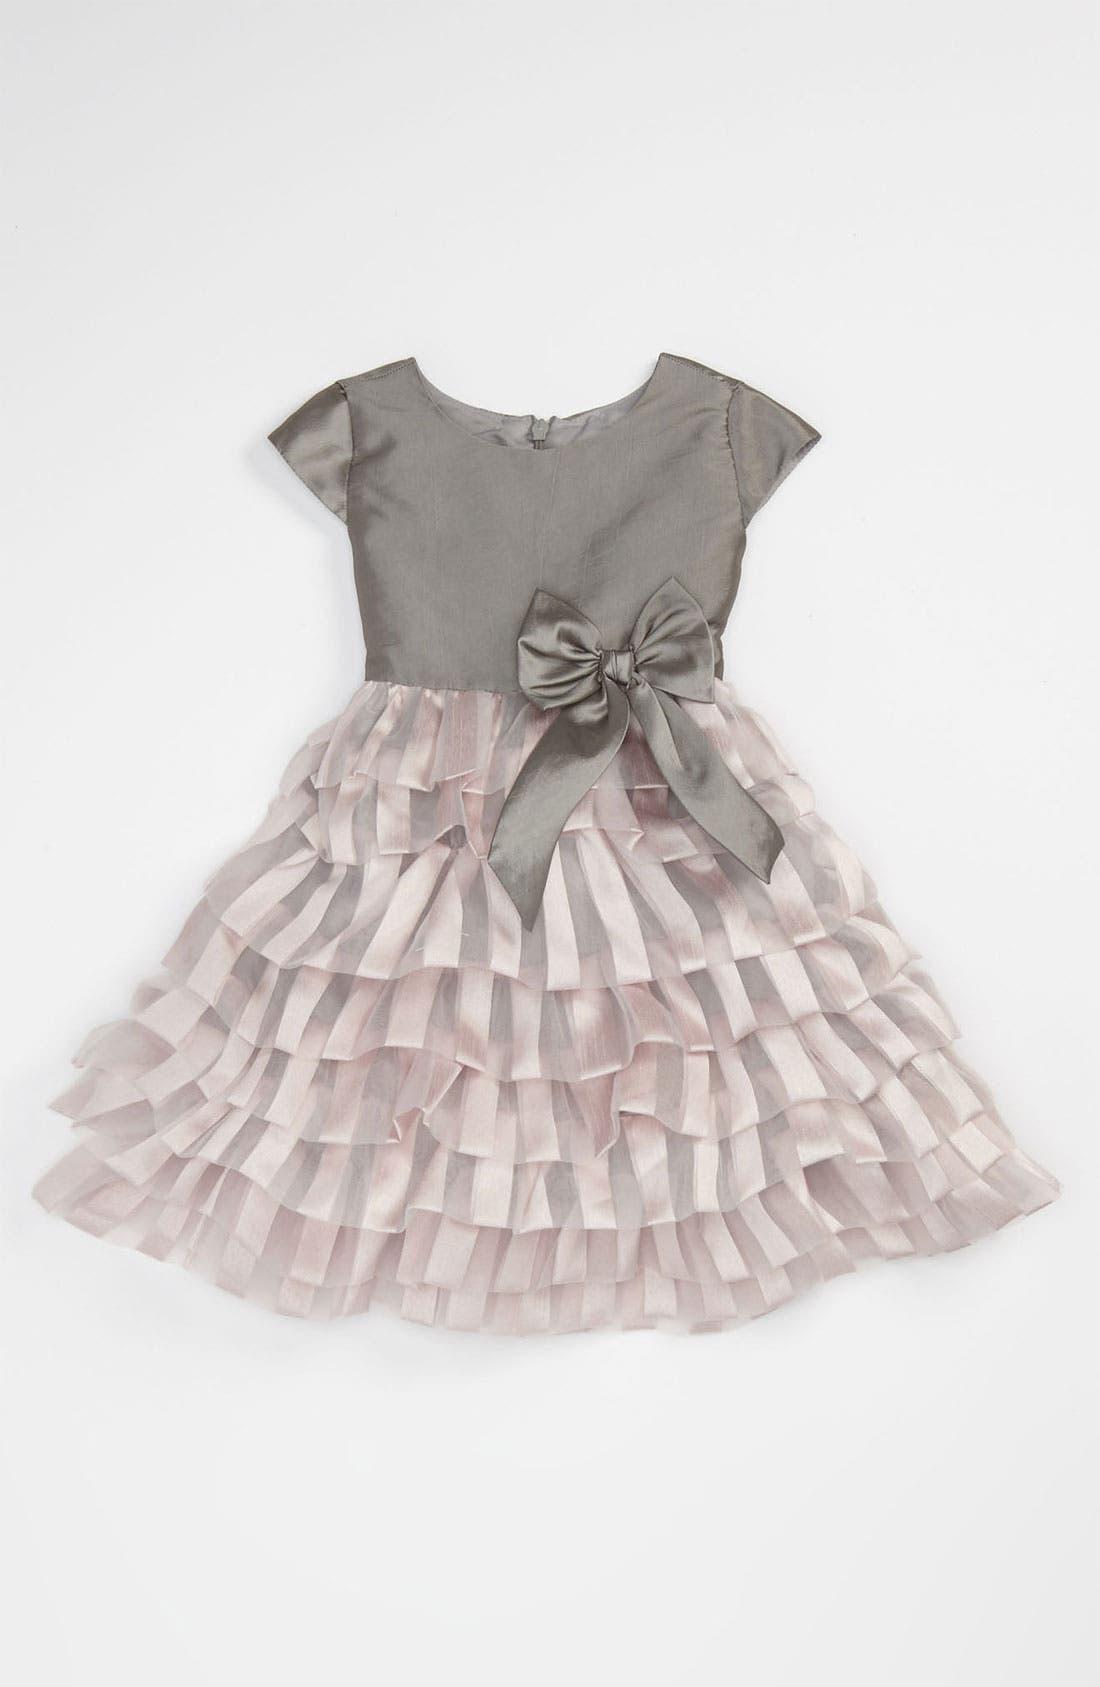 Main Image - Isobella & Chloe 'Prima Ballerina' Dress (Toddler)